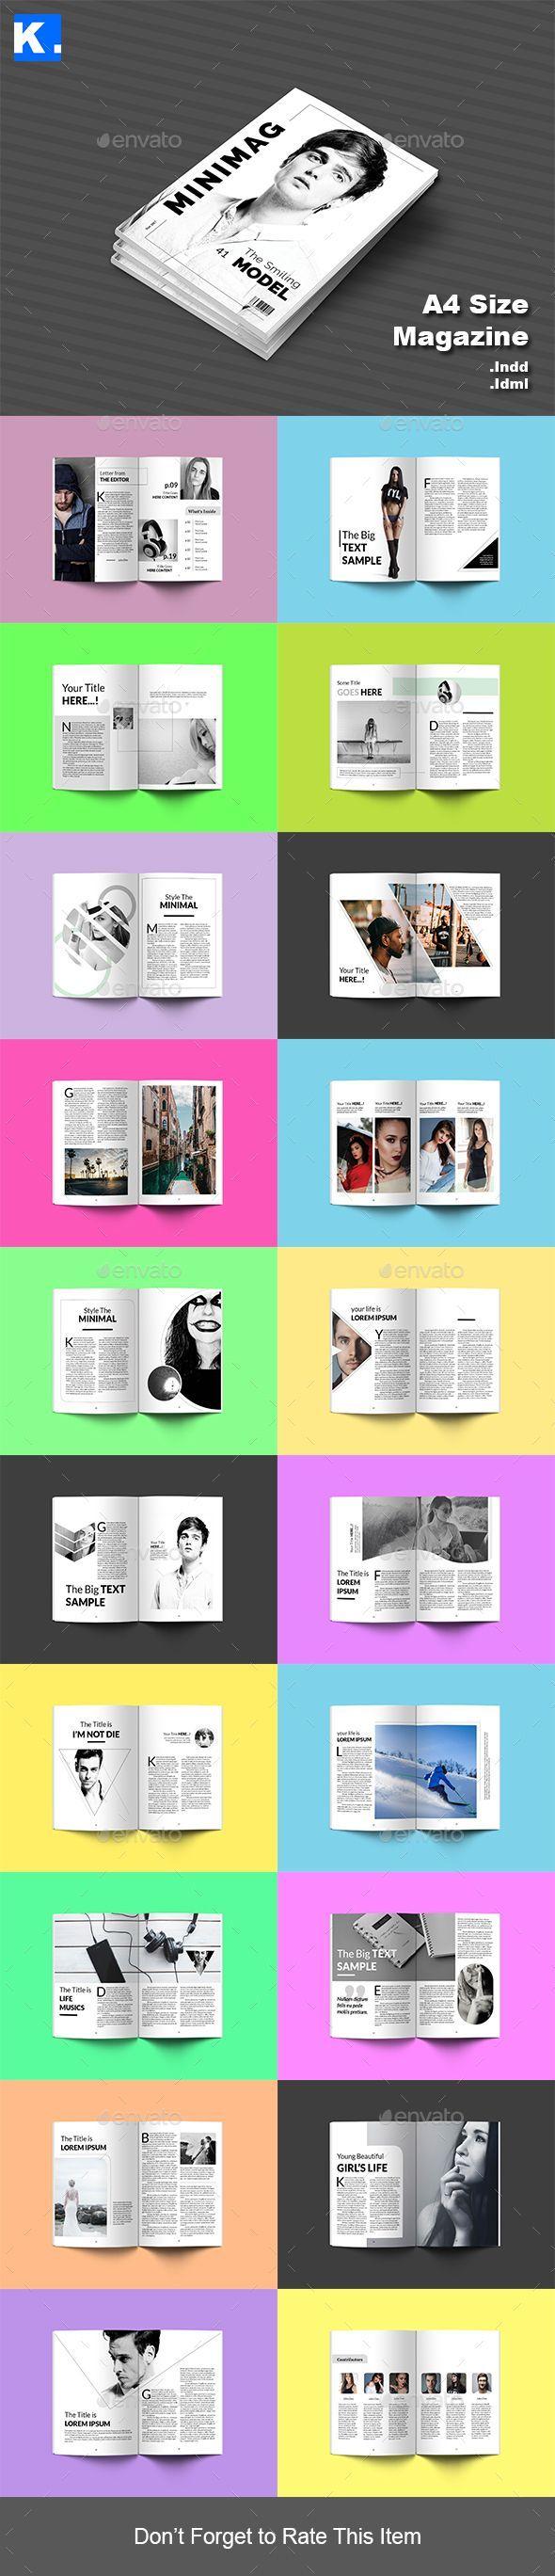 Indesign Magazine Template 3 - Magazines Print Templates